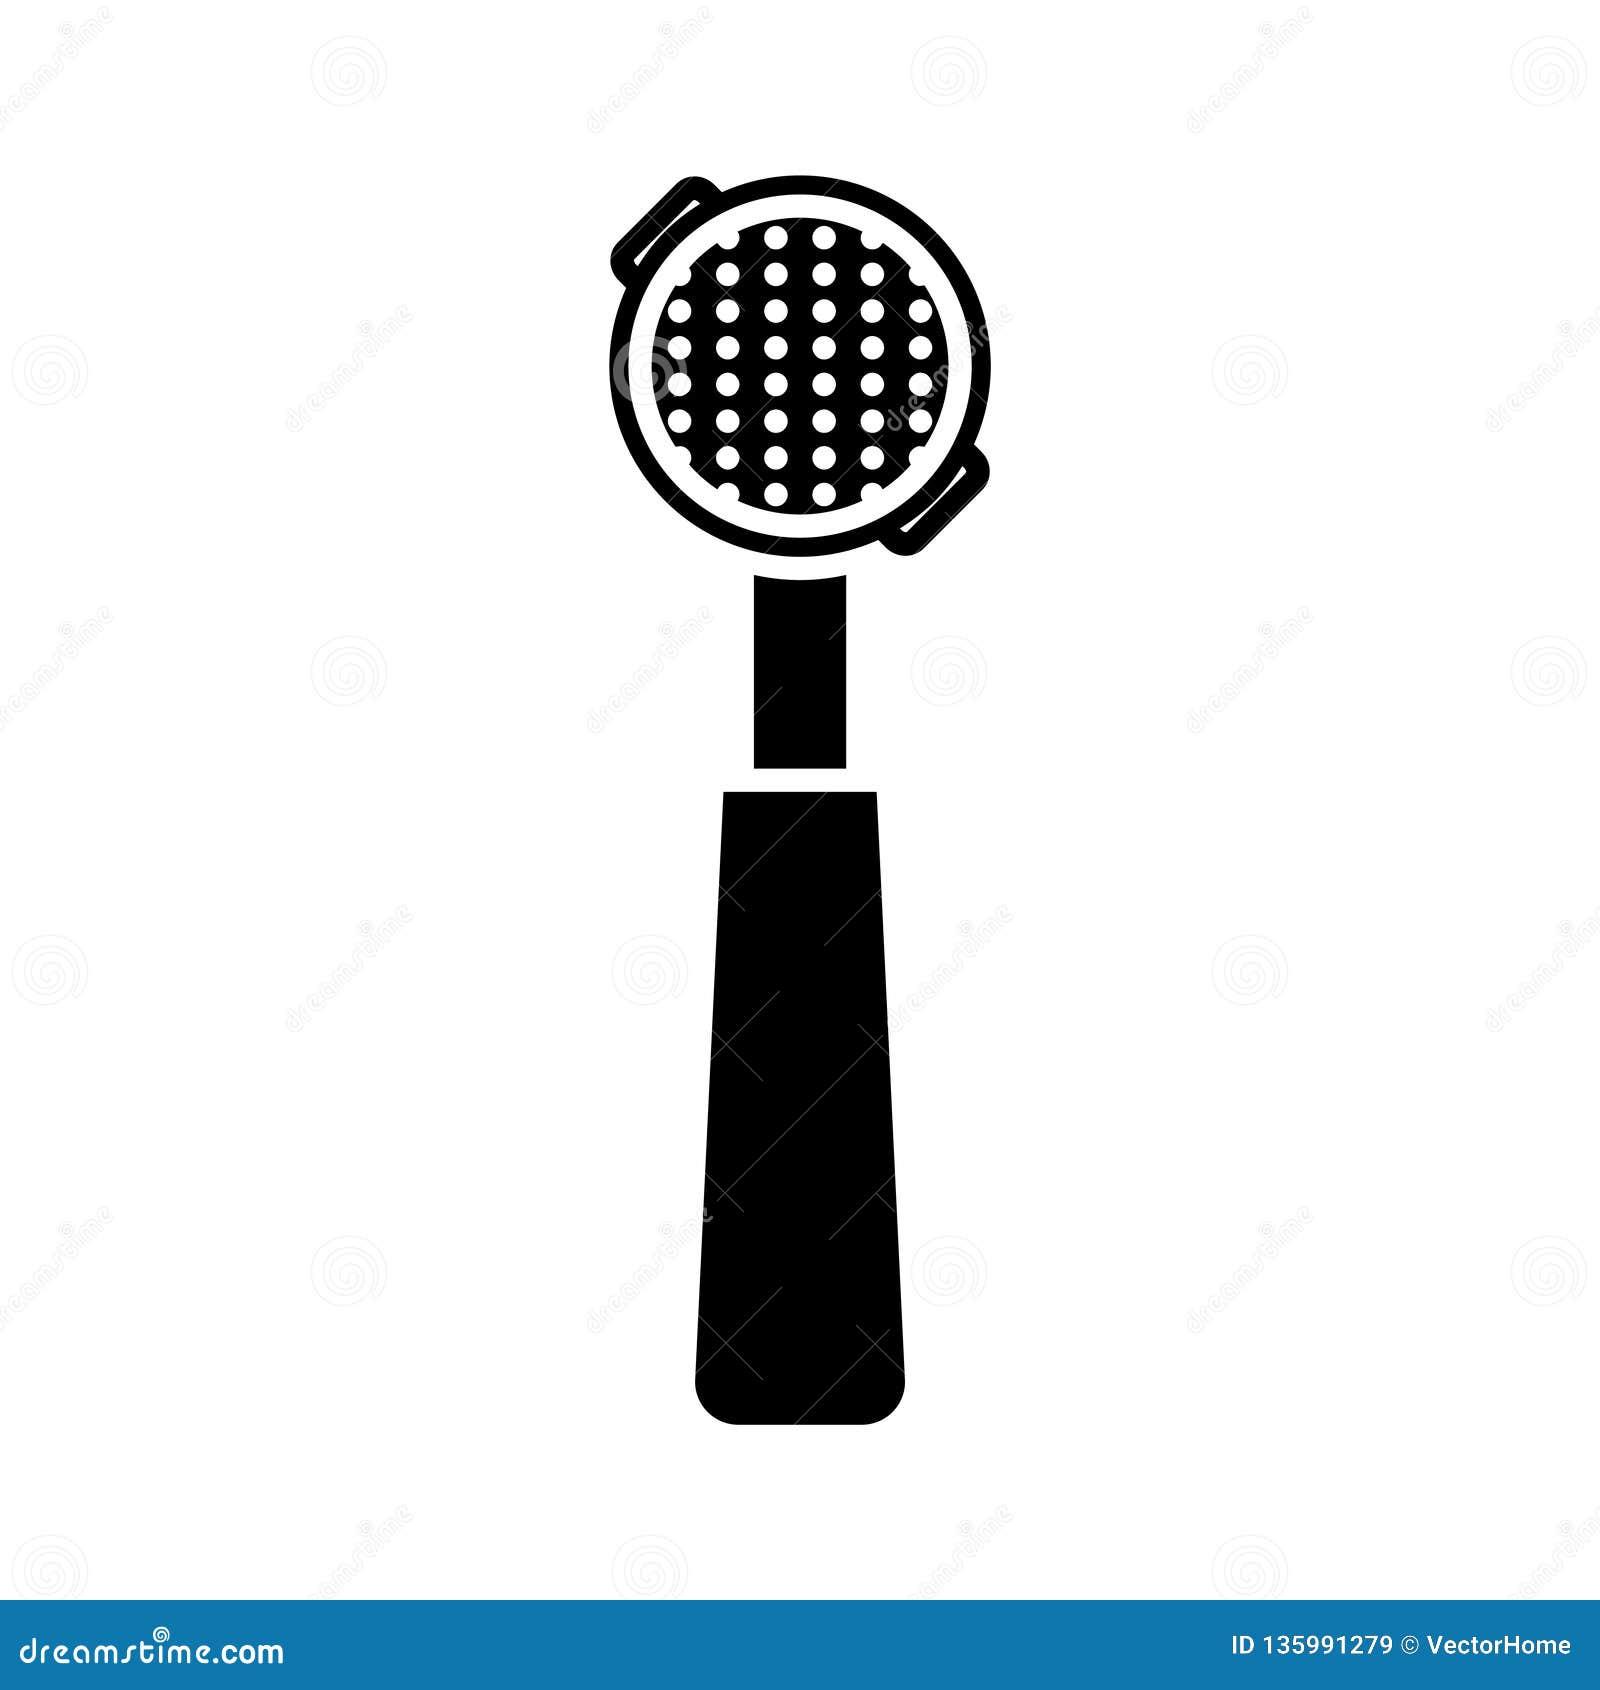 portafilter icon vector illustration stock vector illustration of white grinder 135991279 https www dreamstime com basic cmyk image135991279